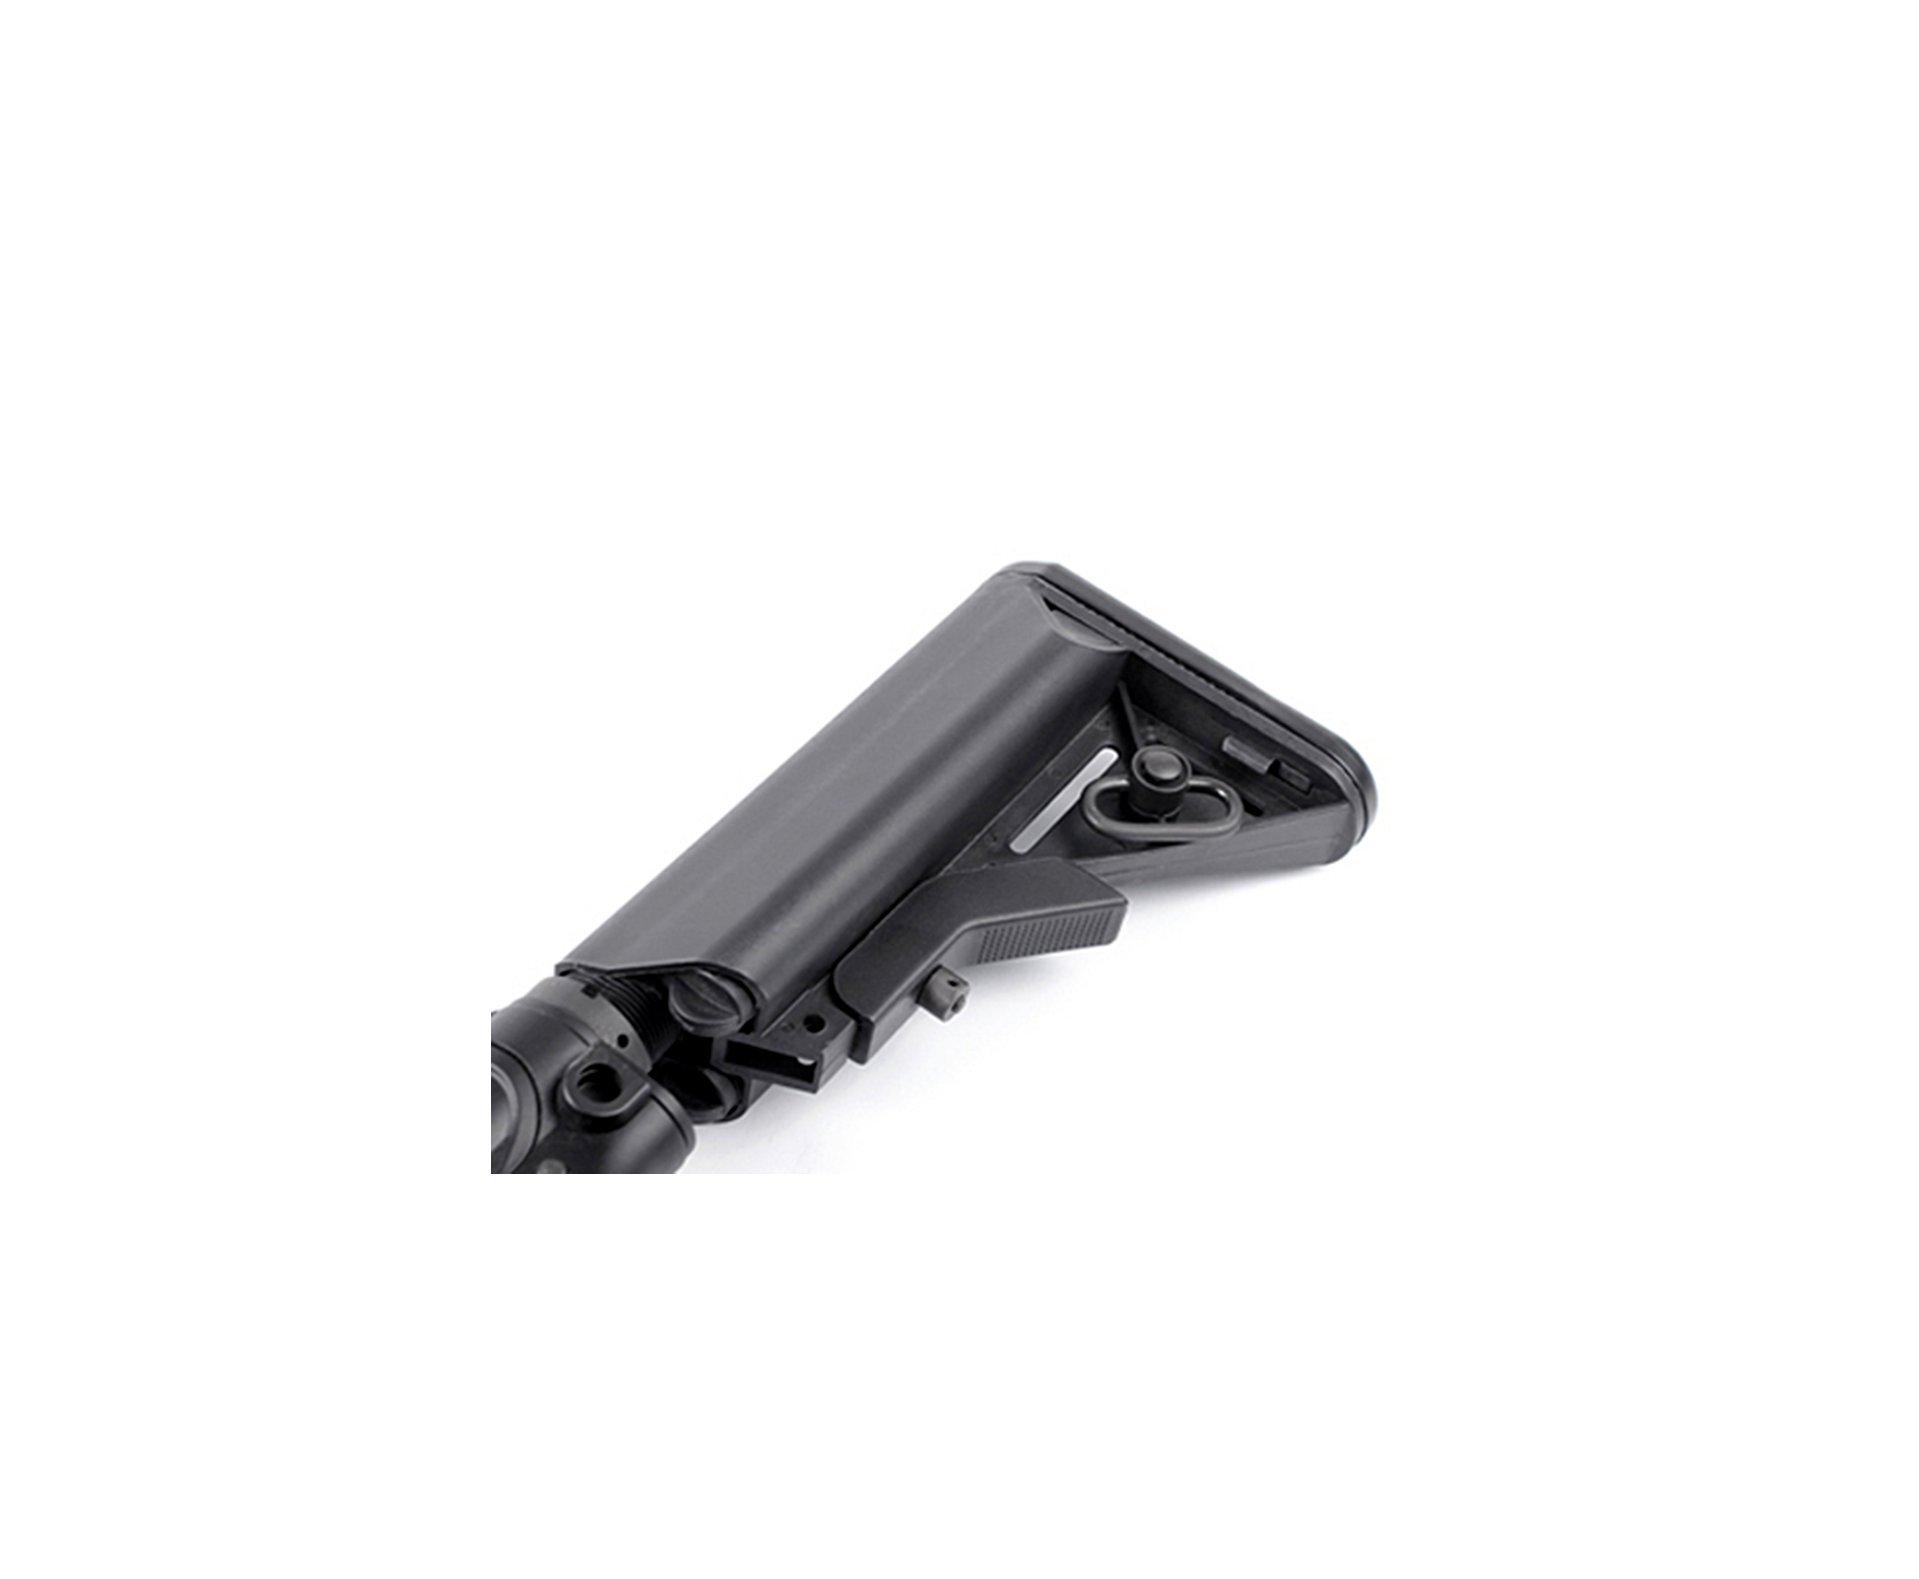 Rifle De Airsoft Sig Sauer 516 Pdw Full Metal - Cal 6.0mm - King Arms